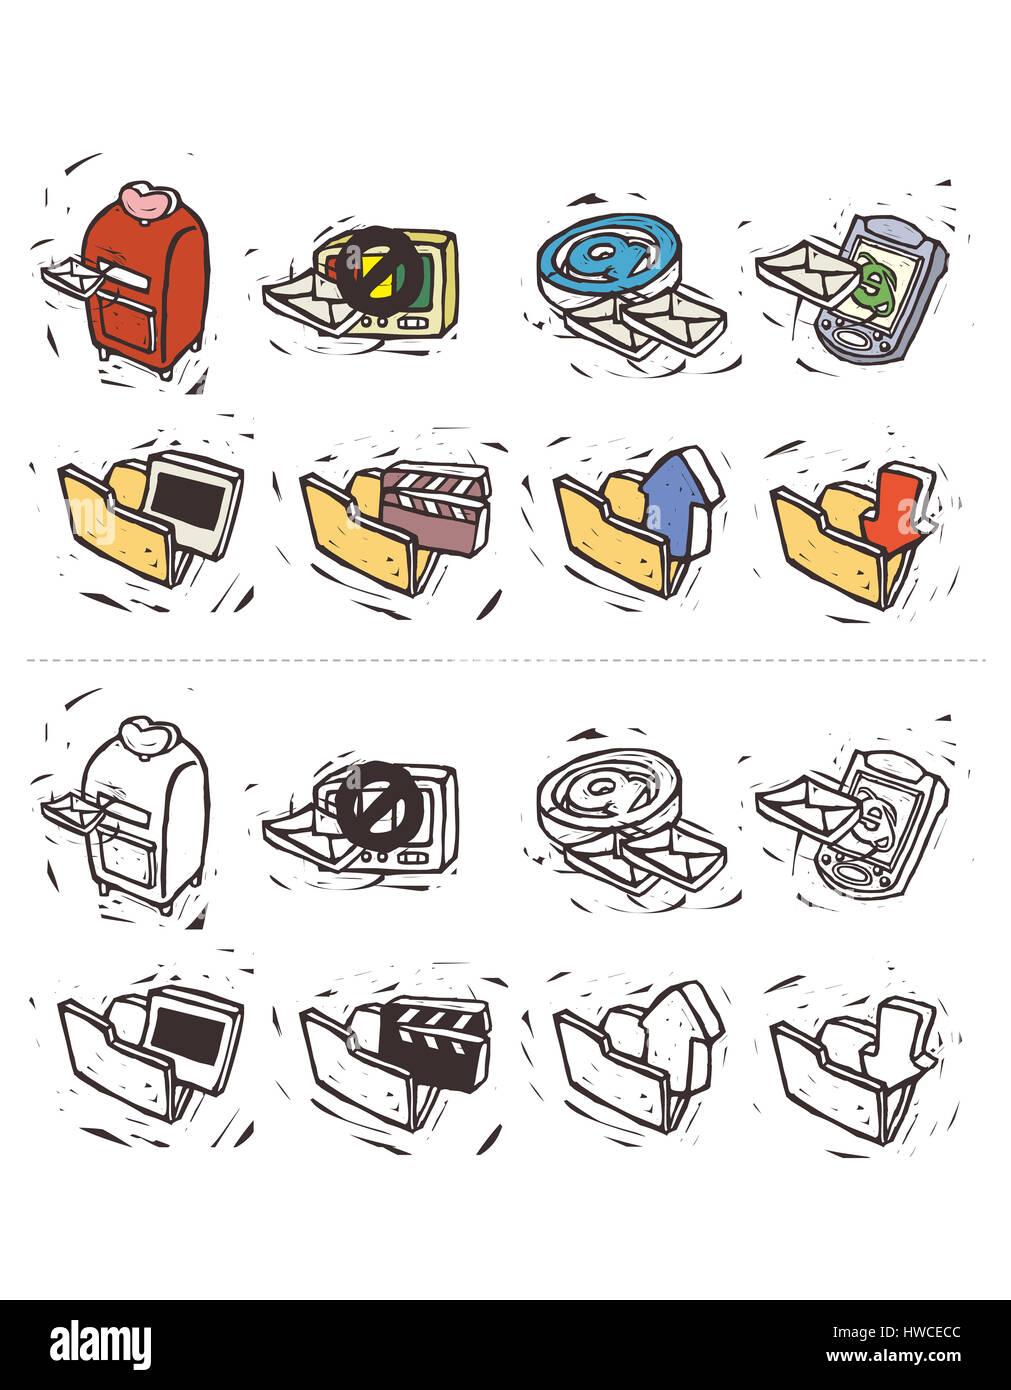 arrangement,arrow,arrow sign,bizarre,collection,color image,communication,computer sign,concepts,connection,correspondence,creativity,depiction,direction,display,downward,e - Stock Image